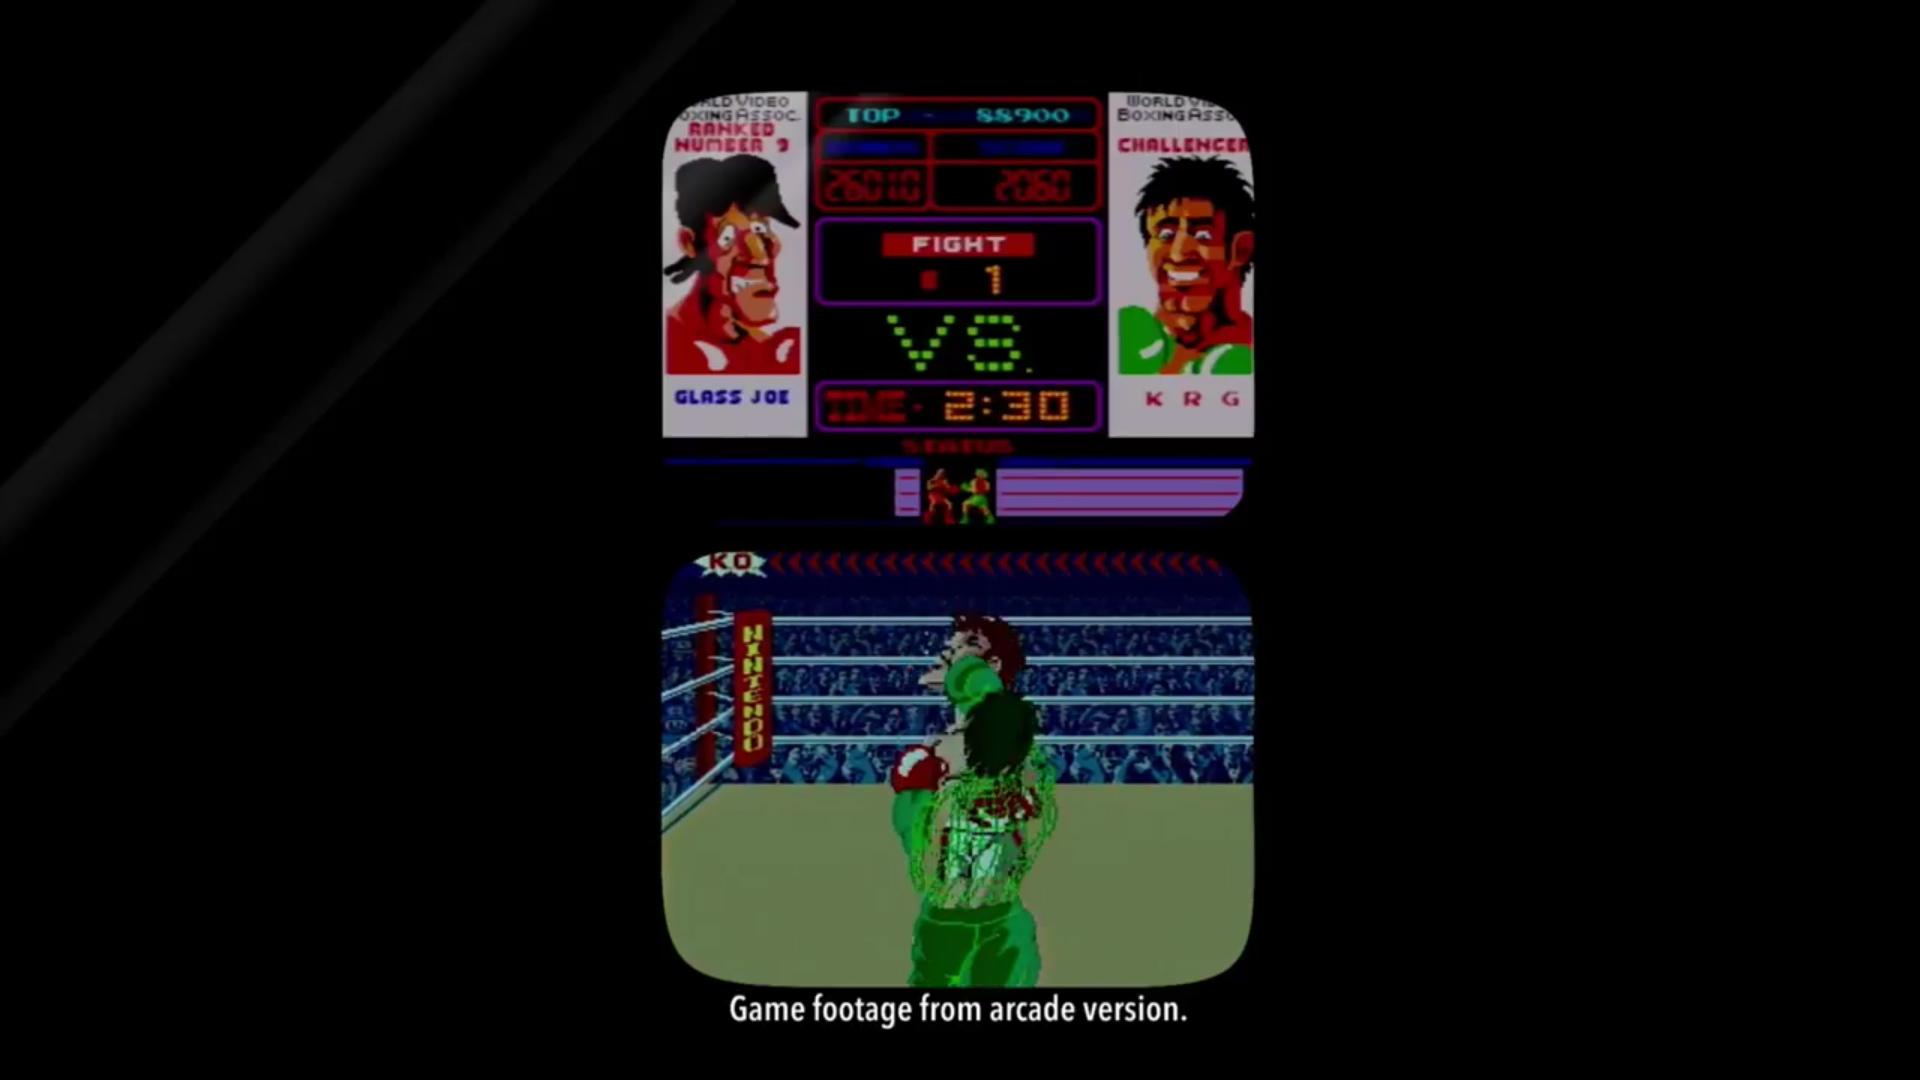 Nintendo arcade games are headed to Switch screenshot